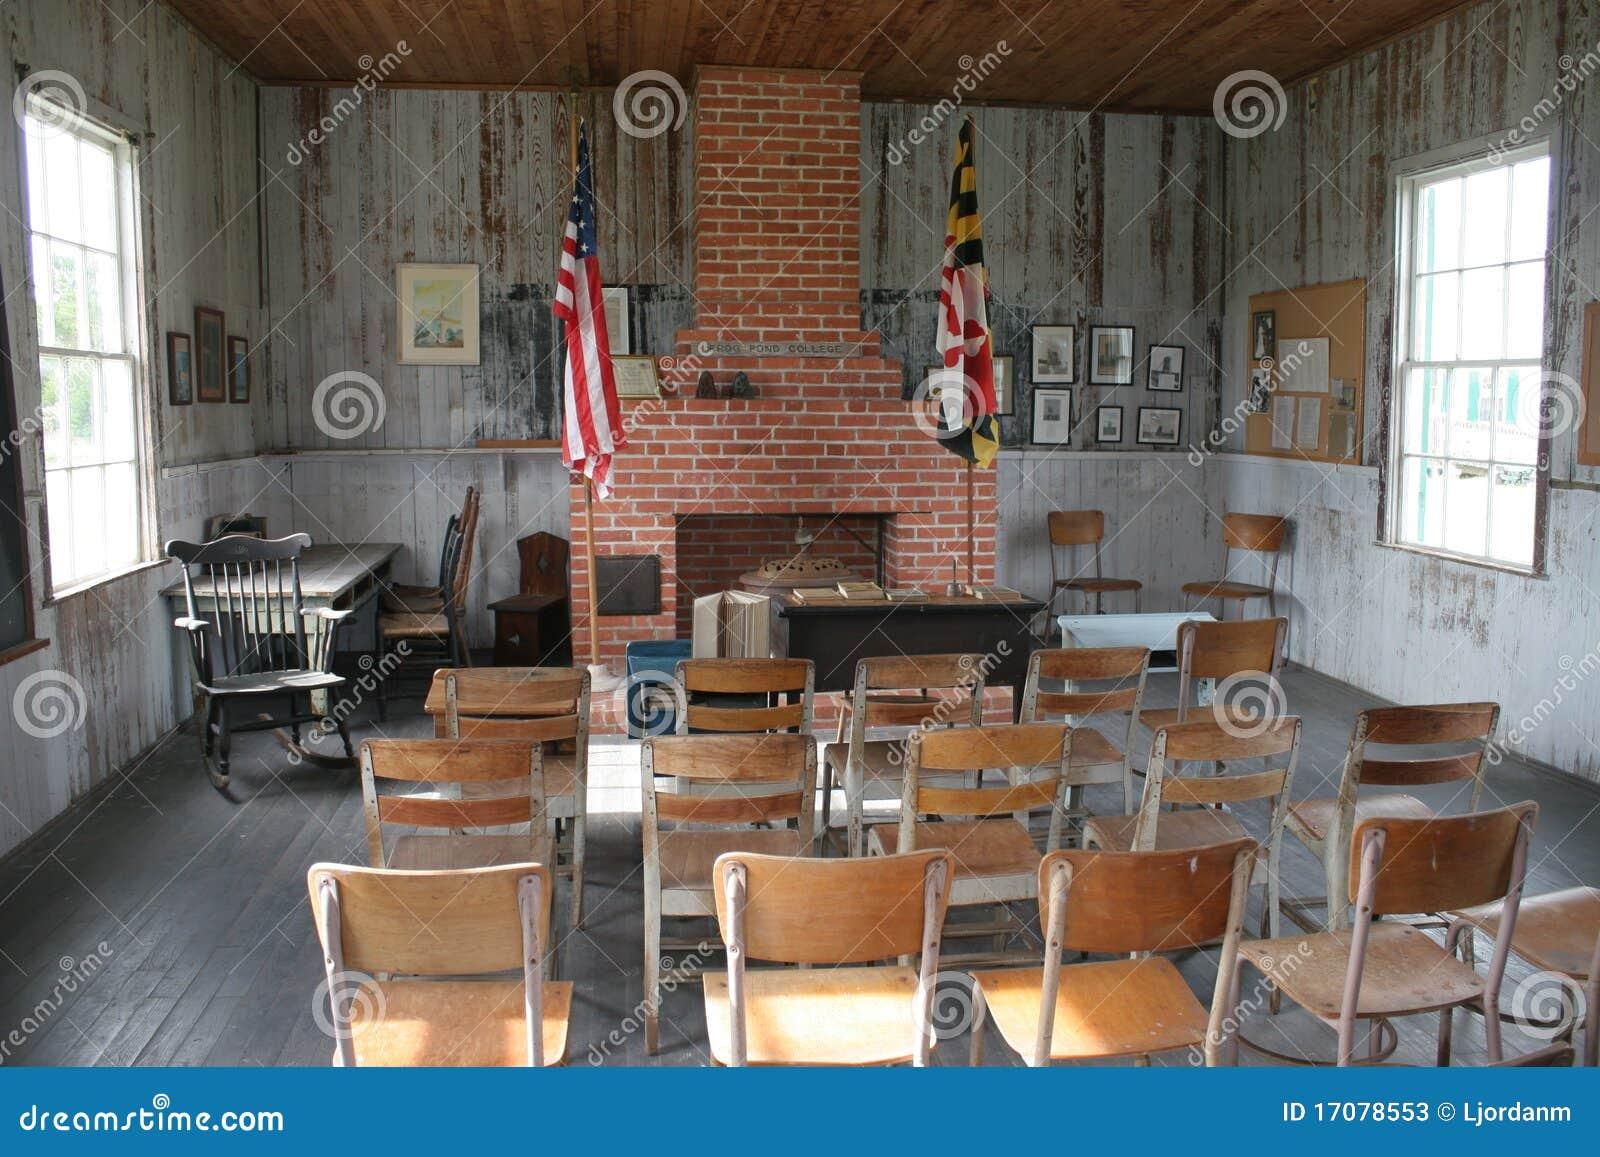 One Room School House